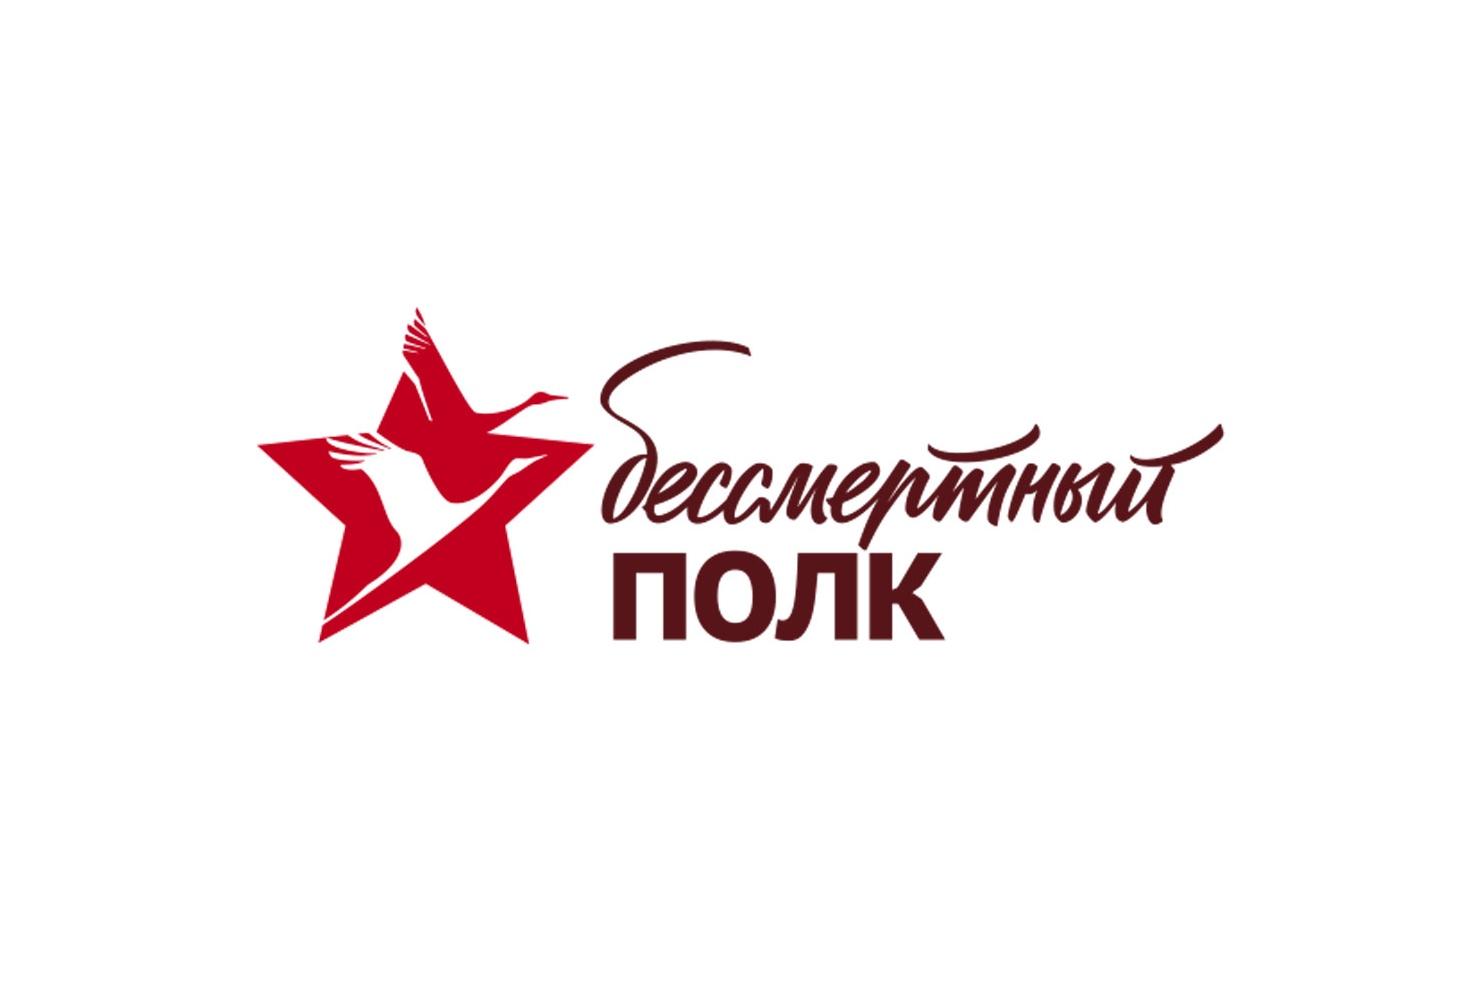 razin-aleksandr-ivanovich